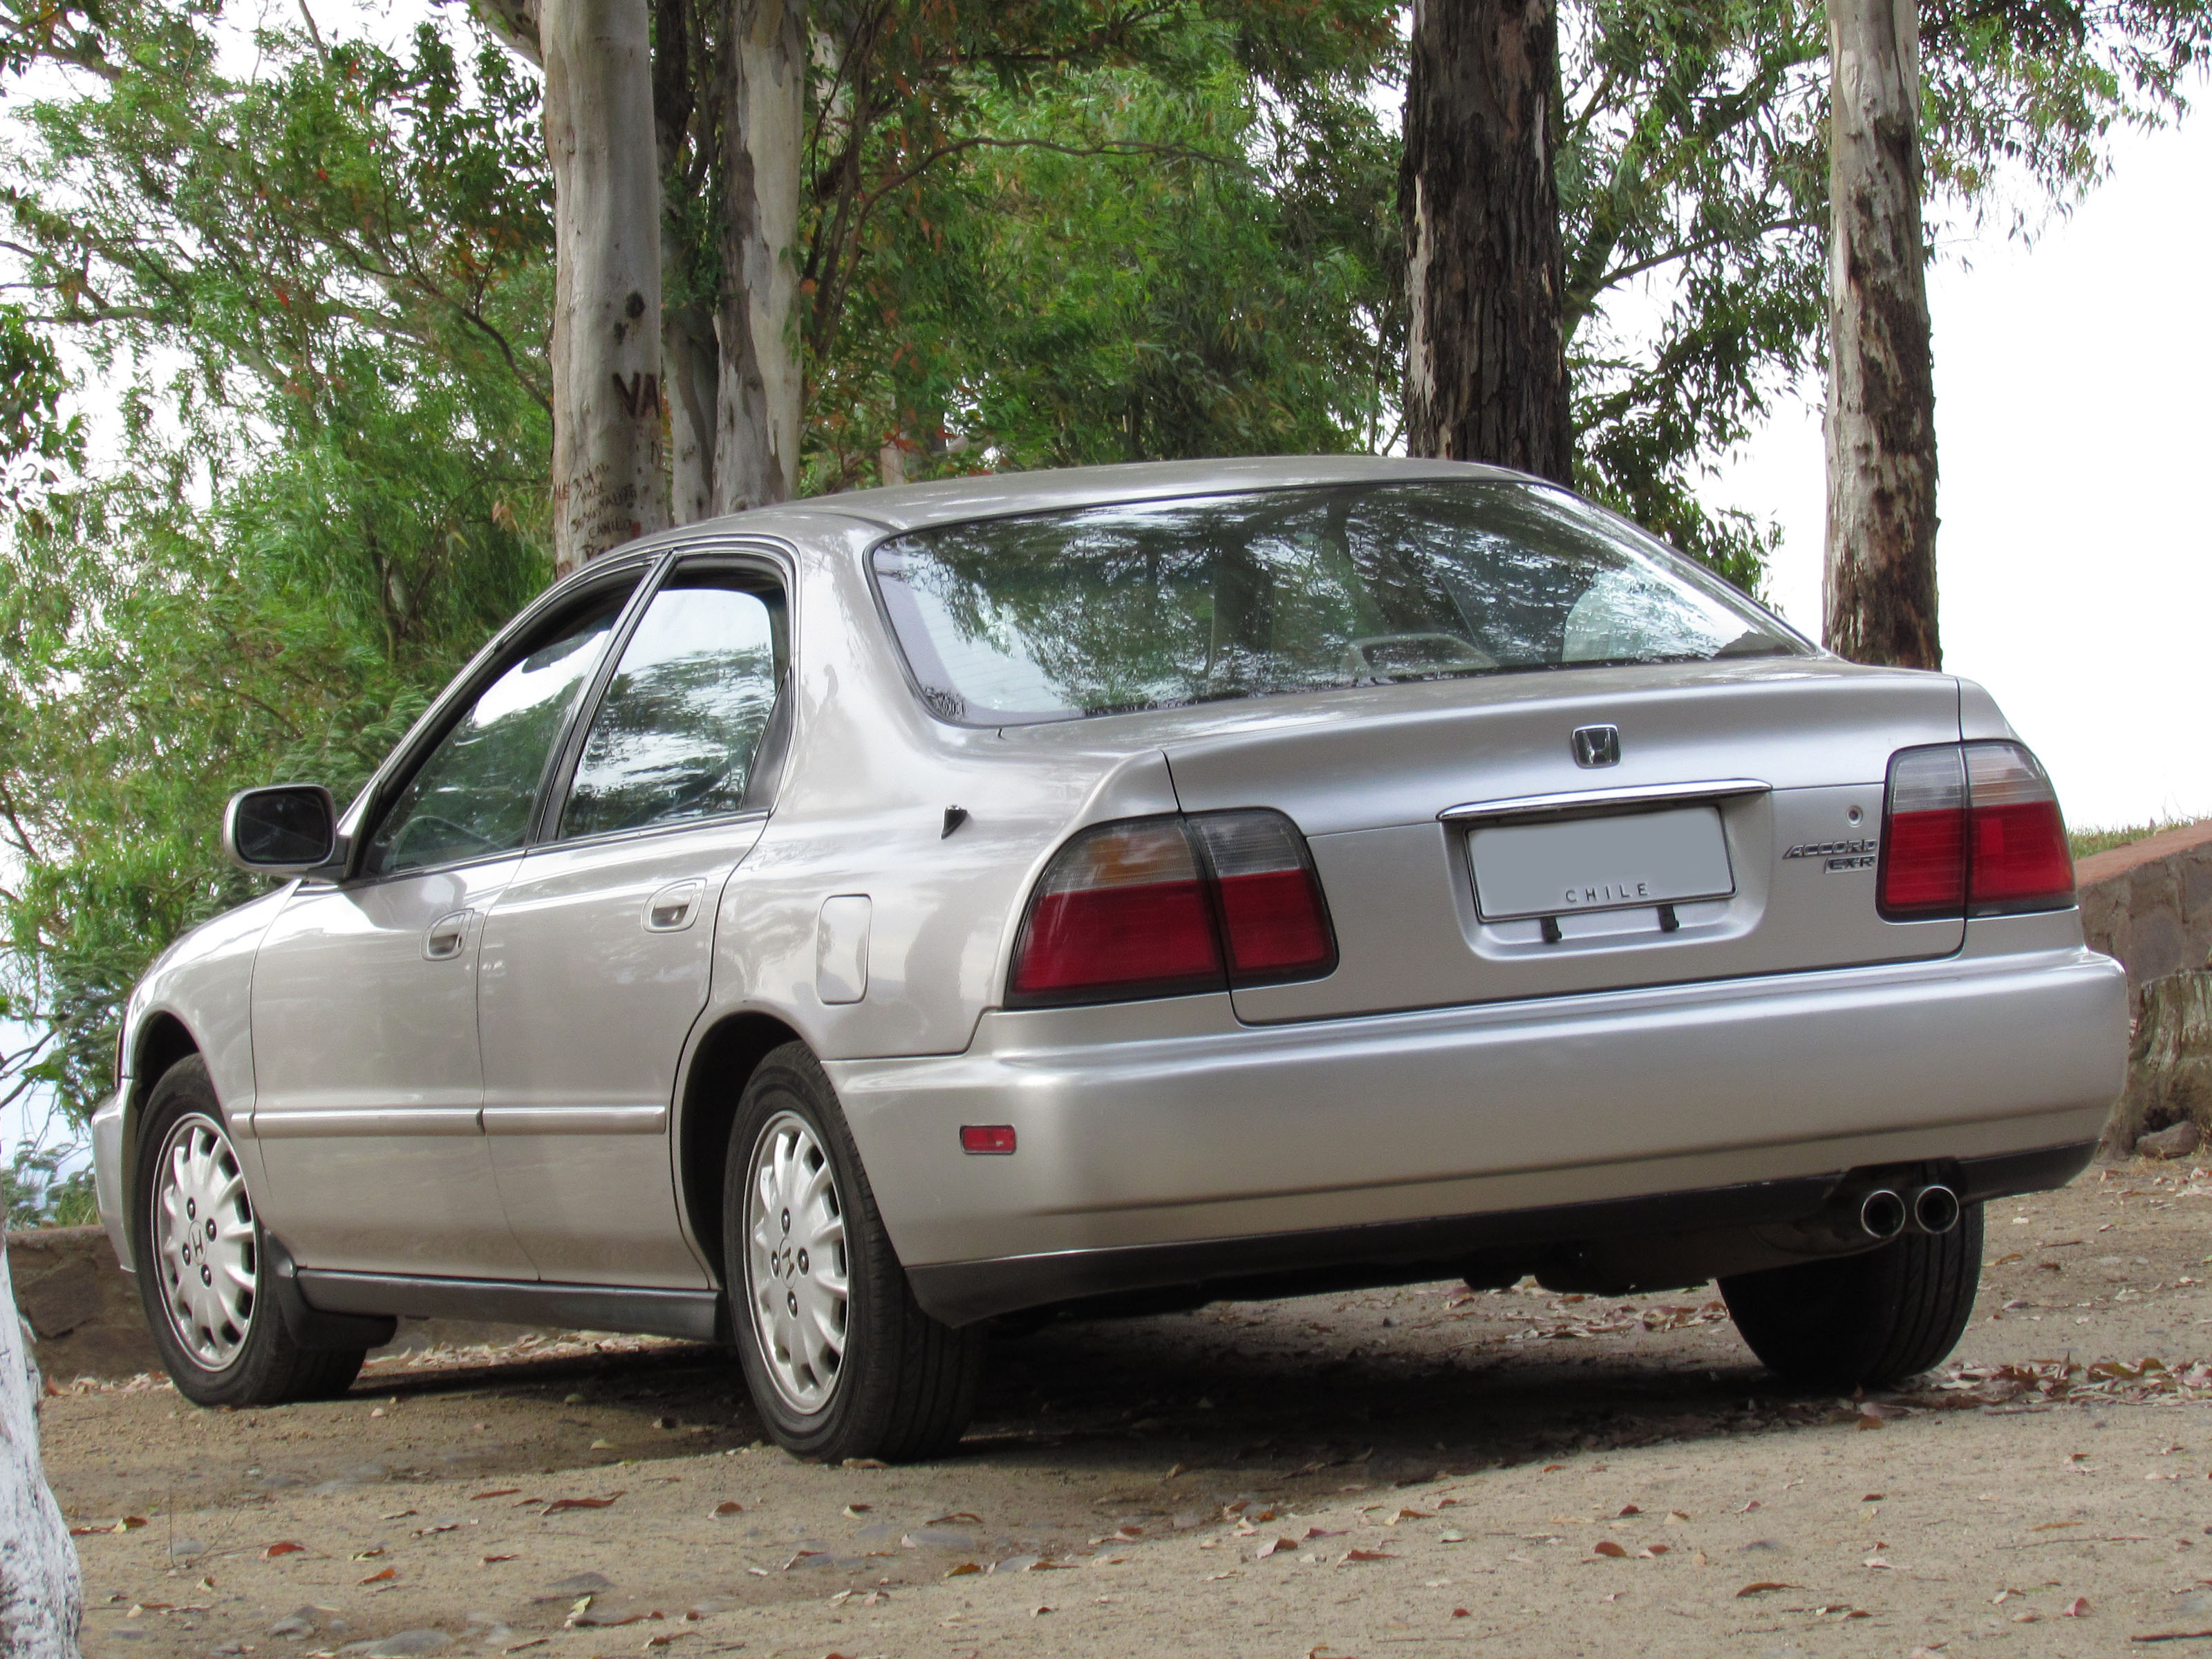 File:Honda Accord 2.2 EX-R 1996 (11879166973).jpg - Wikimedia Commons